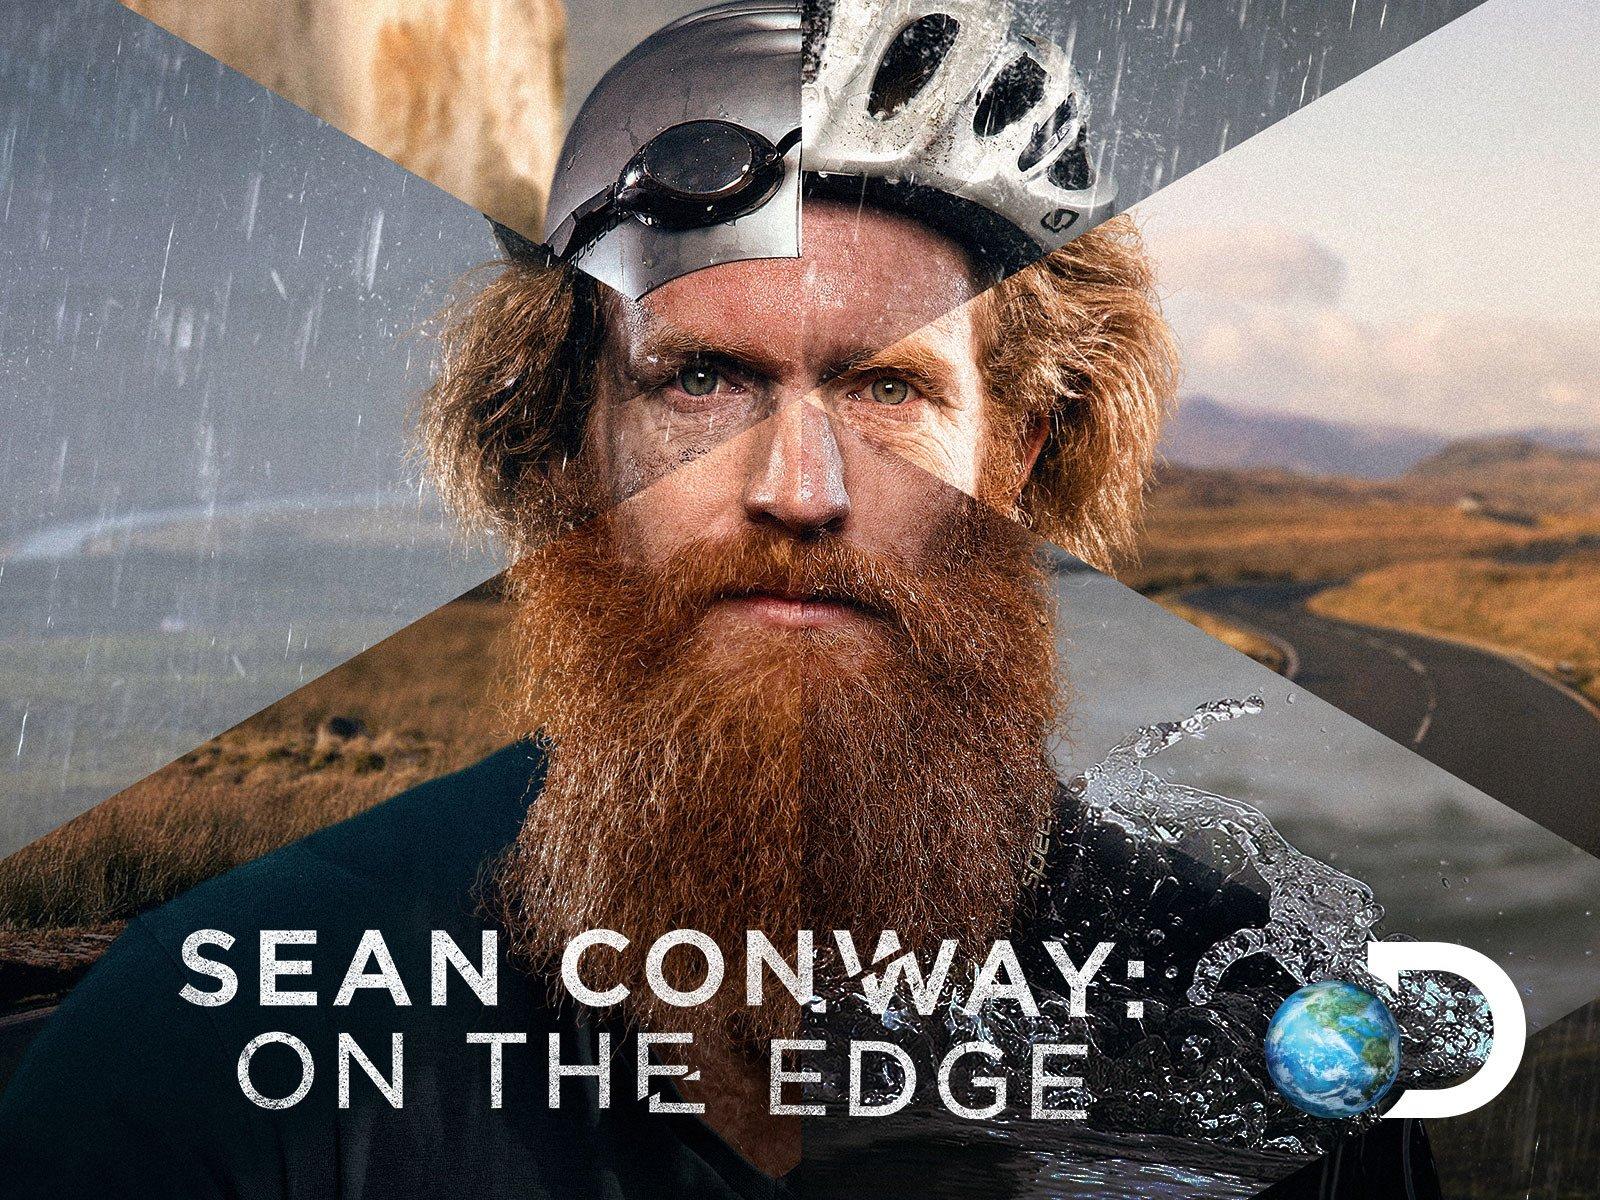 Amazon.co.uk: Watch Sean Conway On The Edge - Season 1 | Prime Video